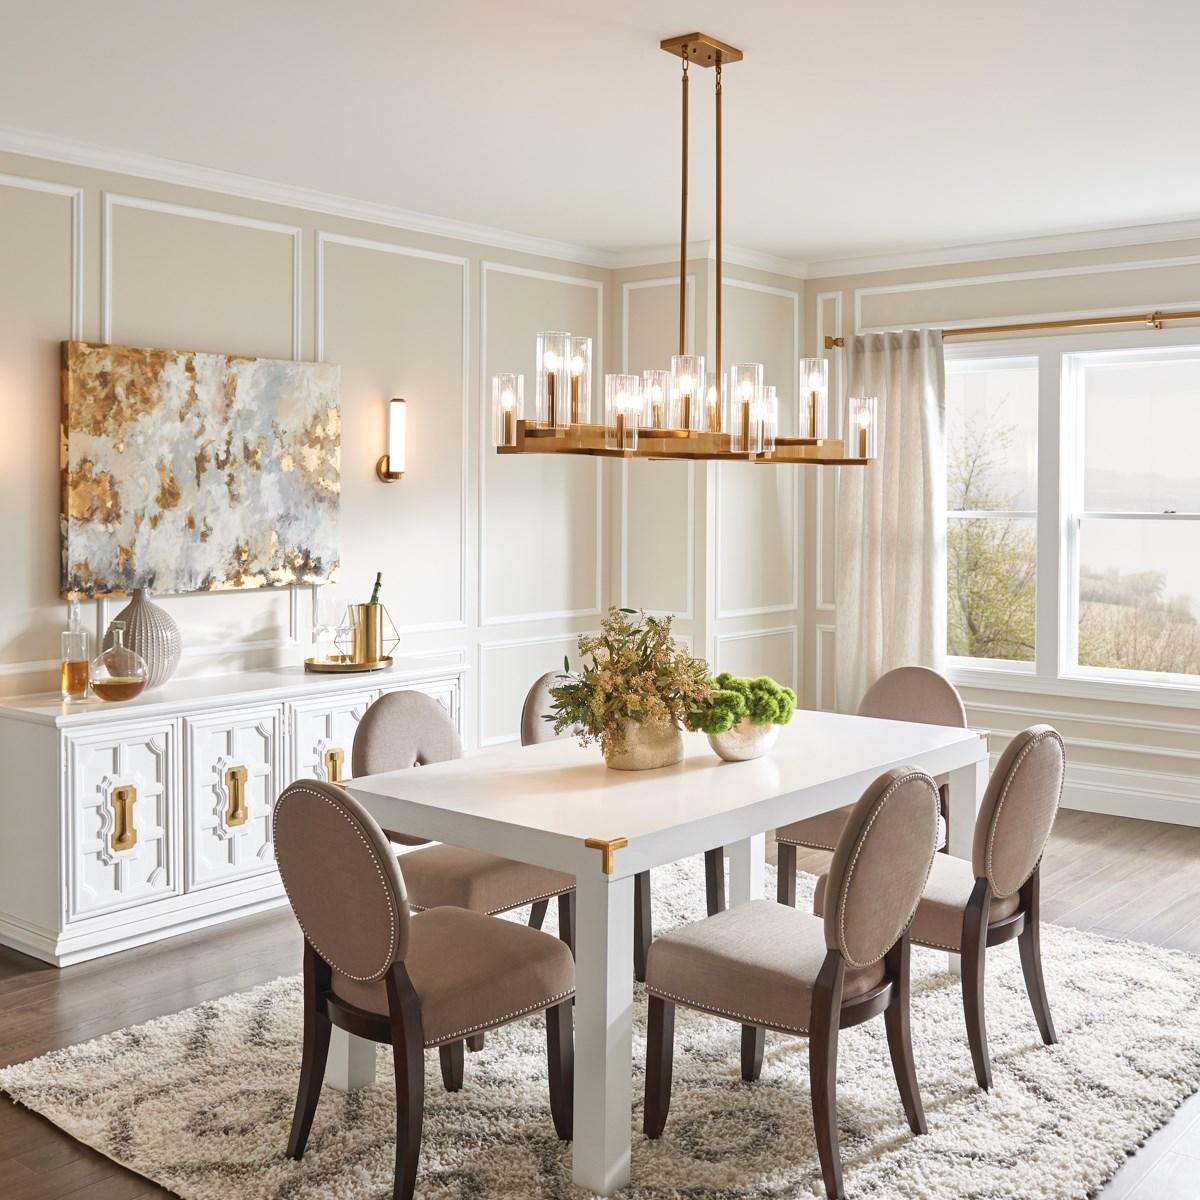 Cleara 14 Light Linear Chandelier Gold, Linear Chandelier Dining Room